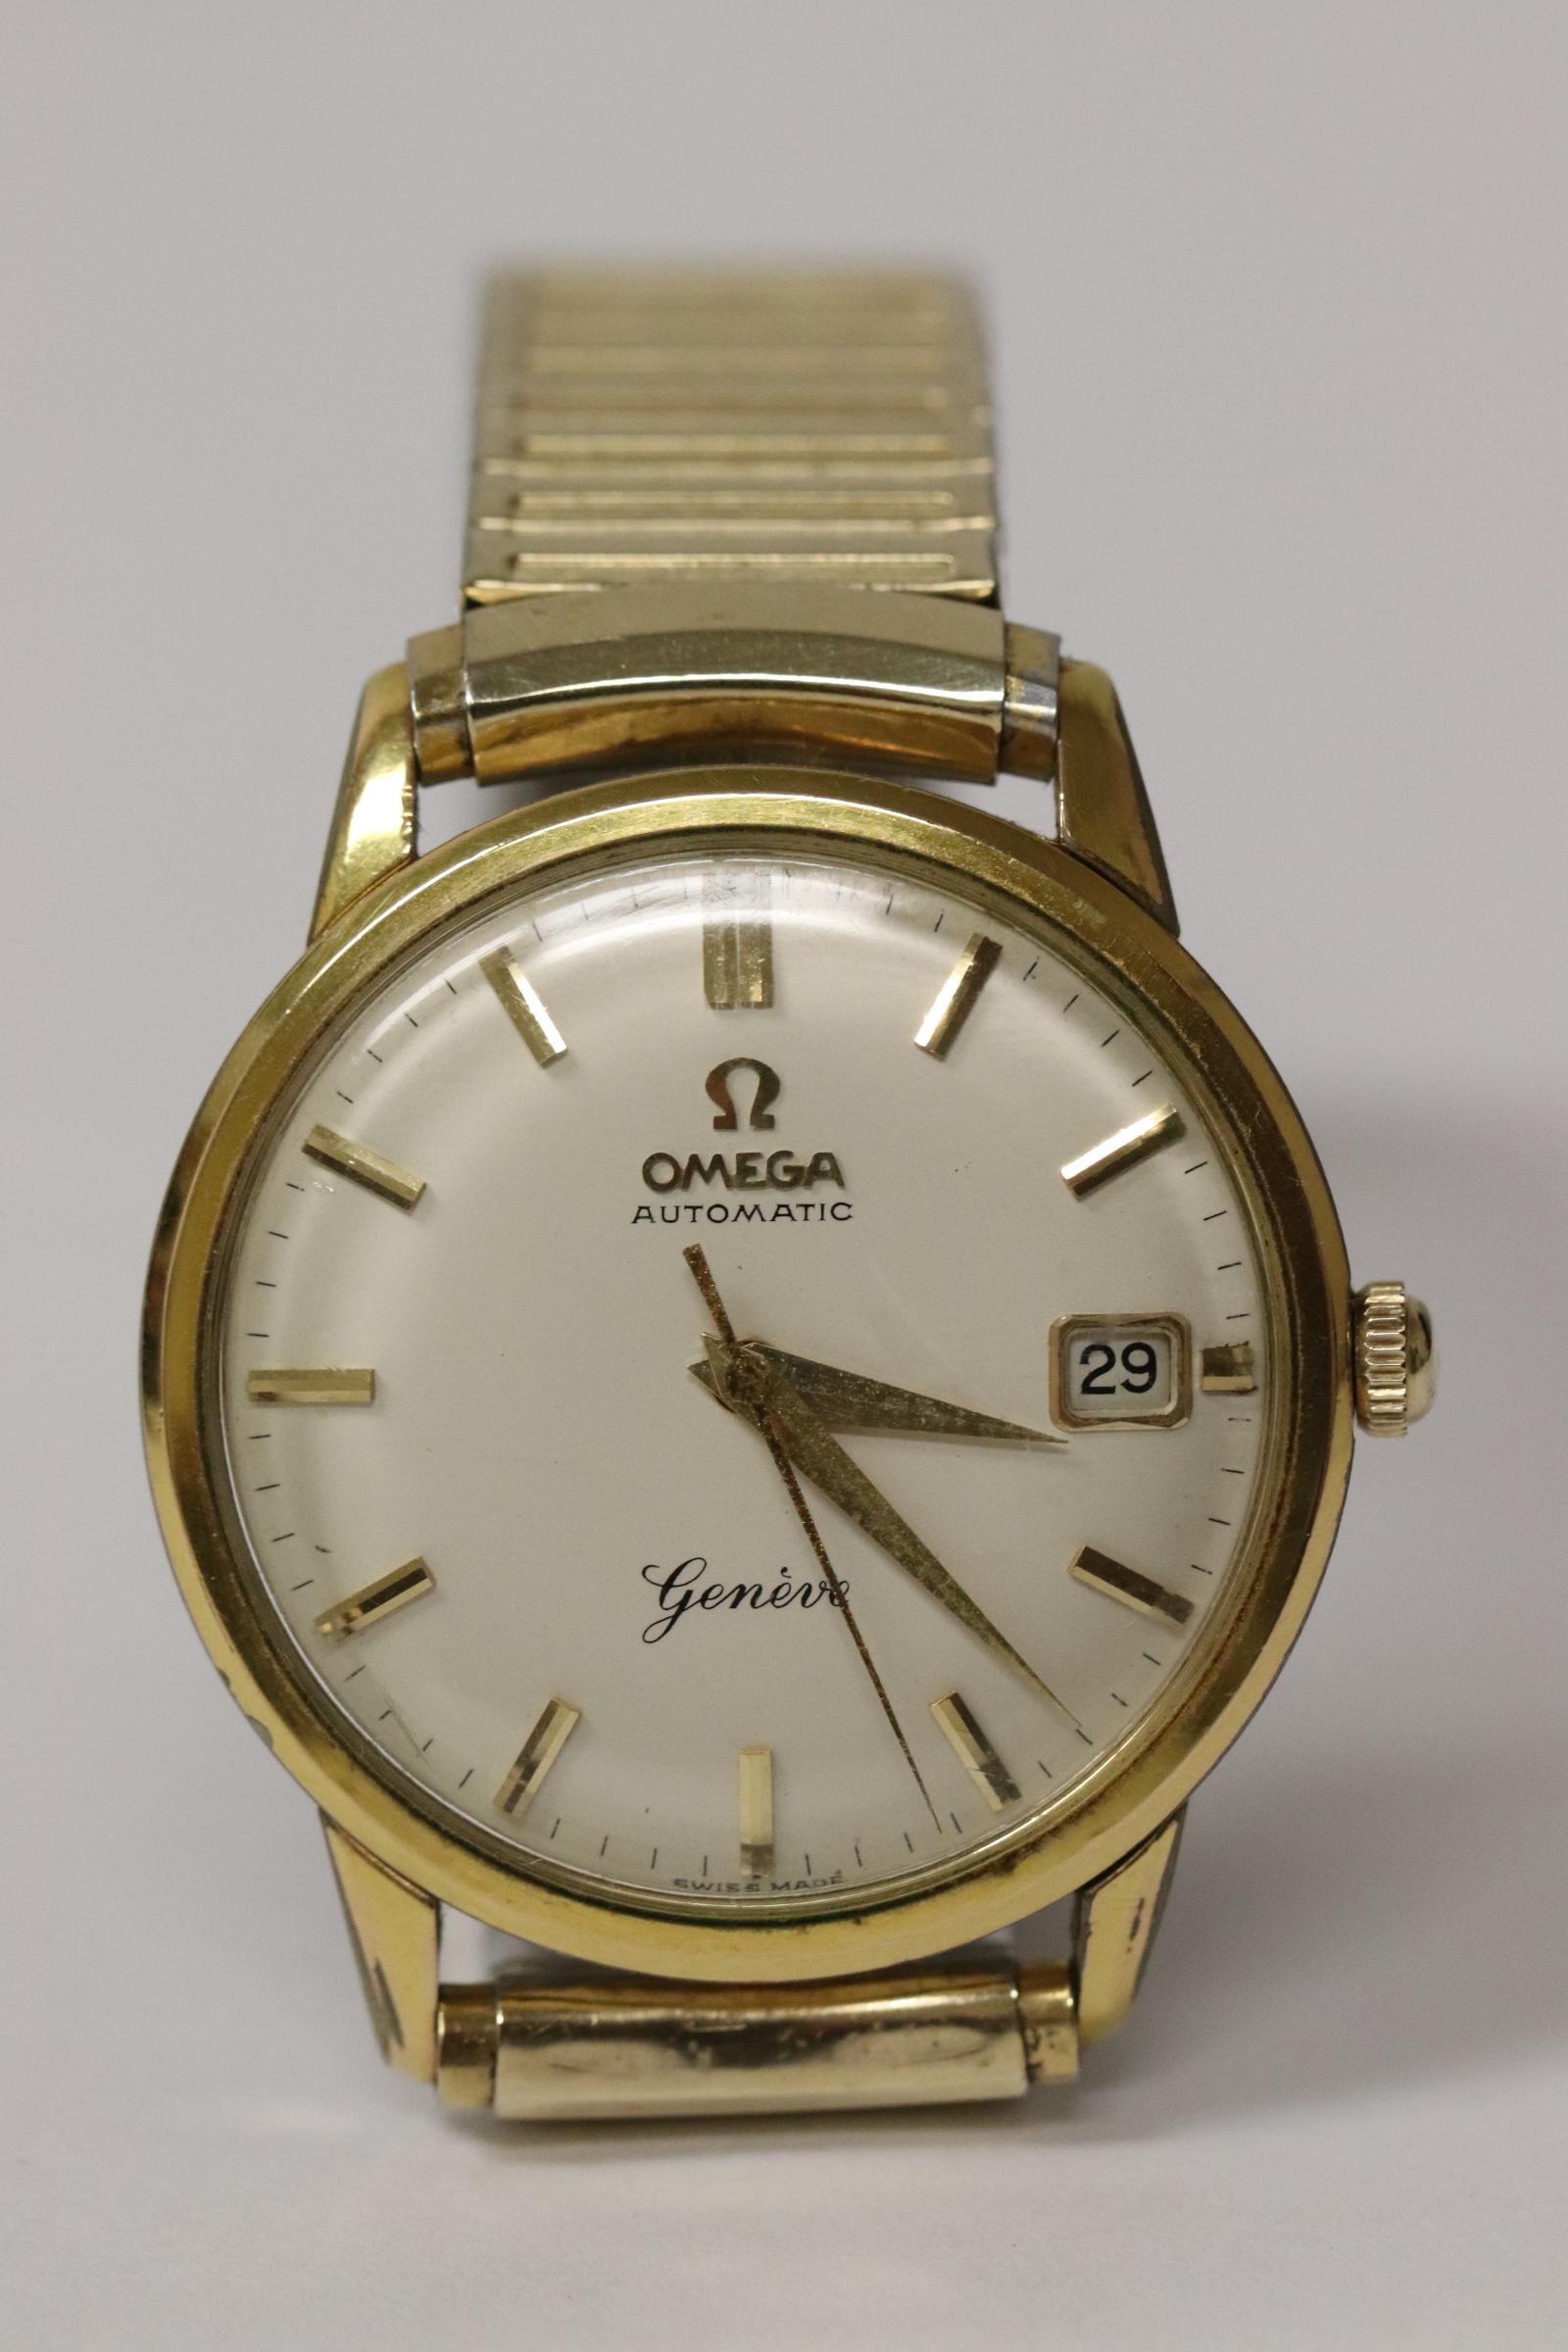 A fine Omega automatic wrist watch